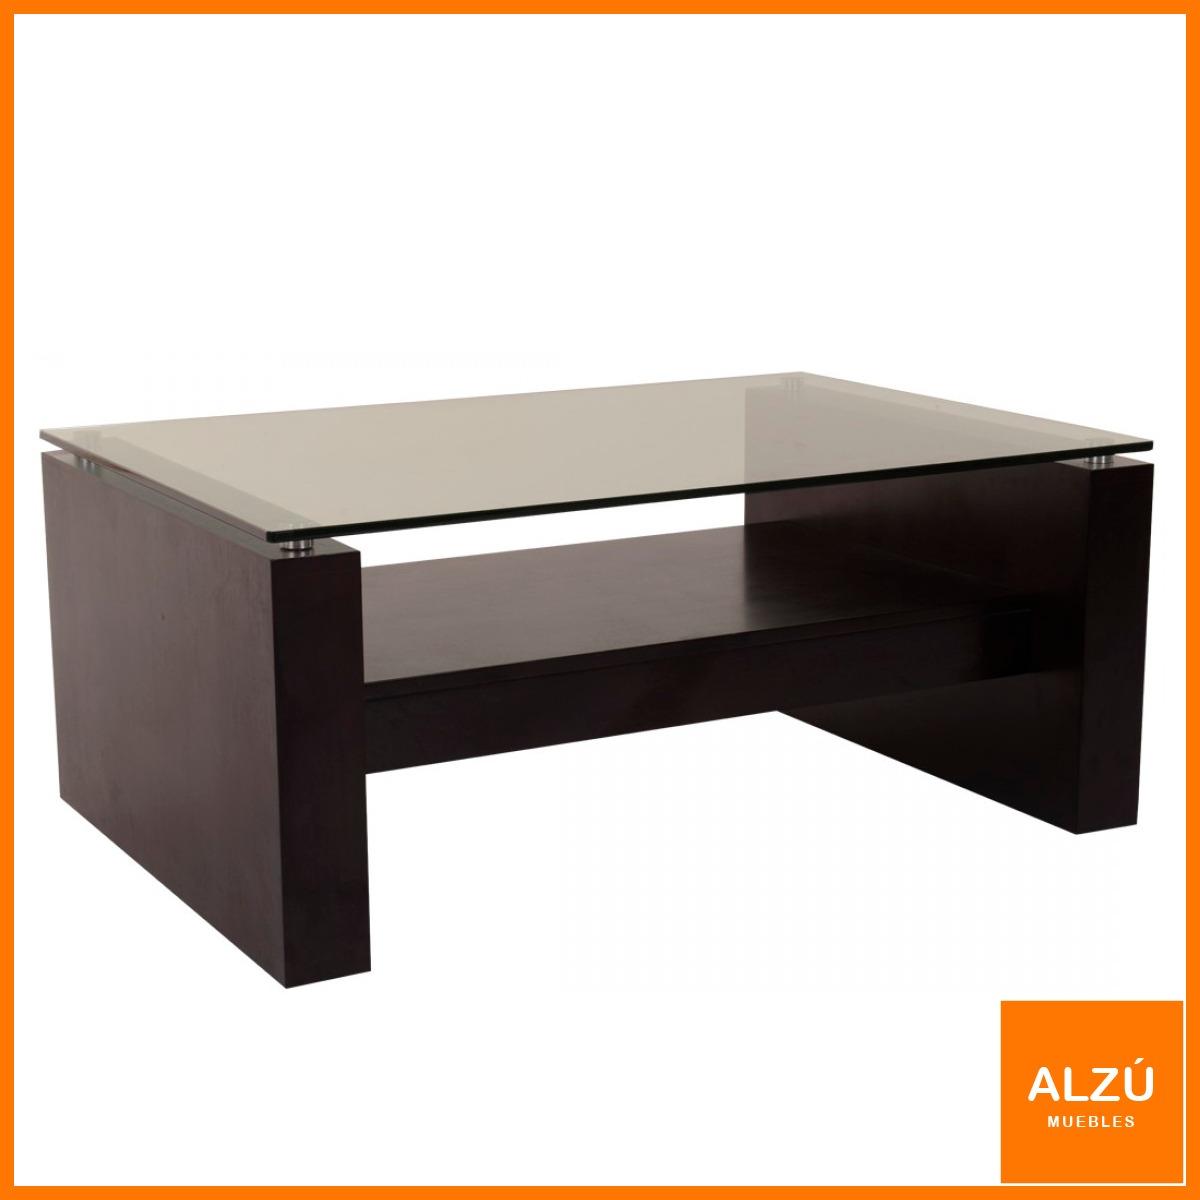 Mesa de centro para sala hay moderna by moble company for Mesas esquineras modernas